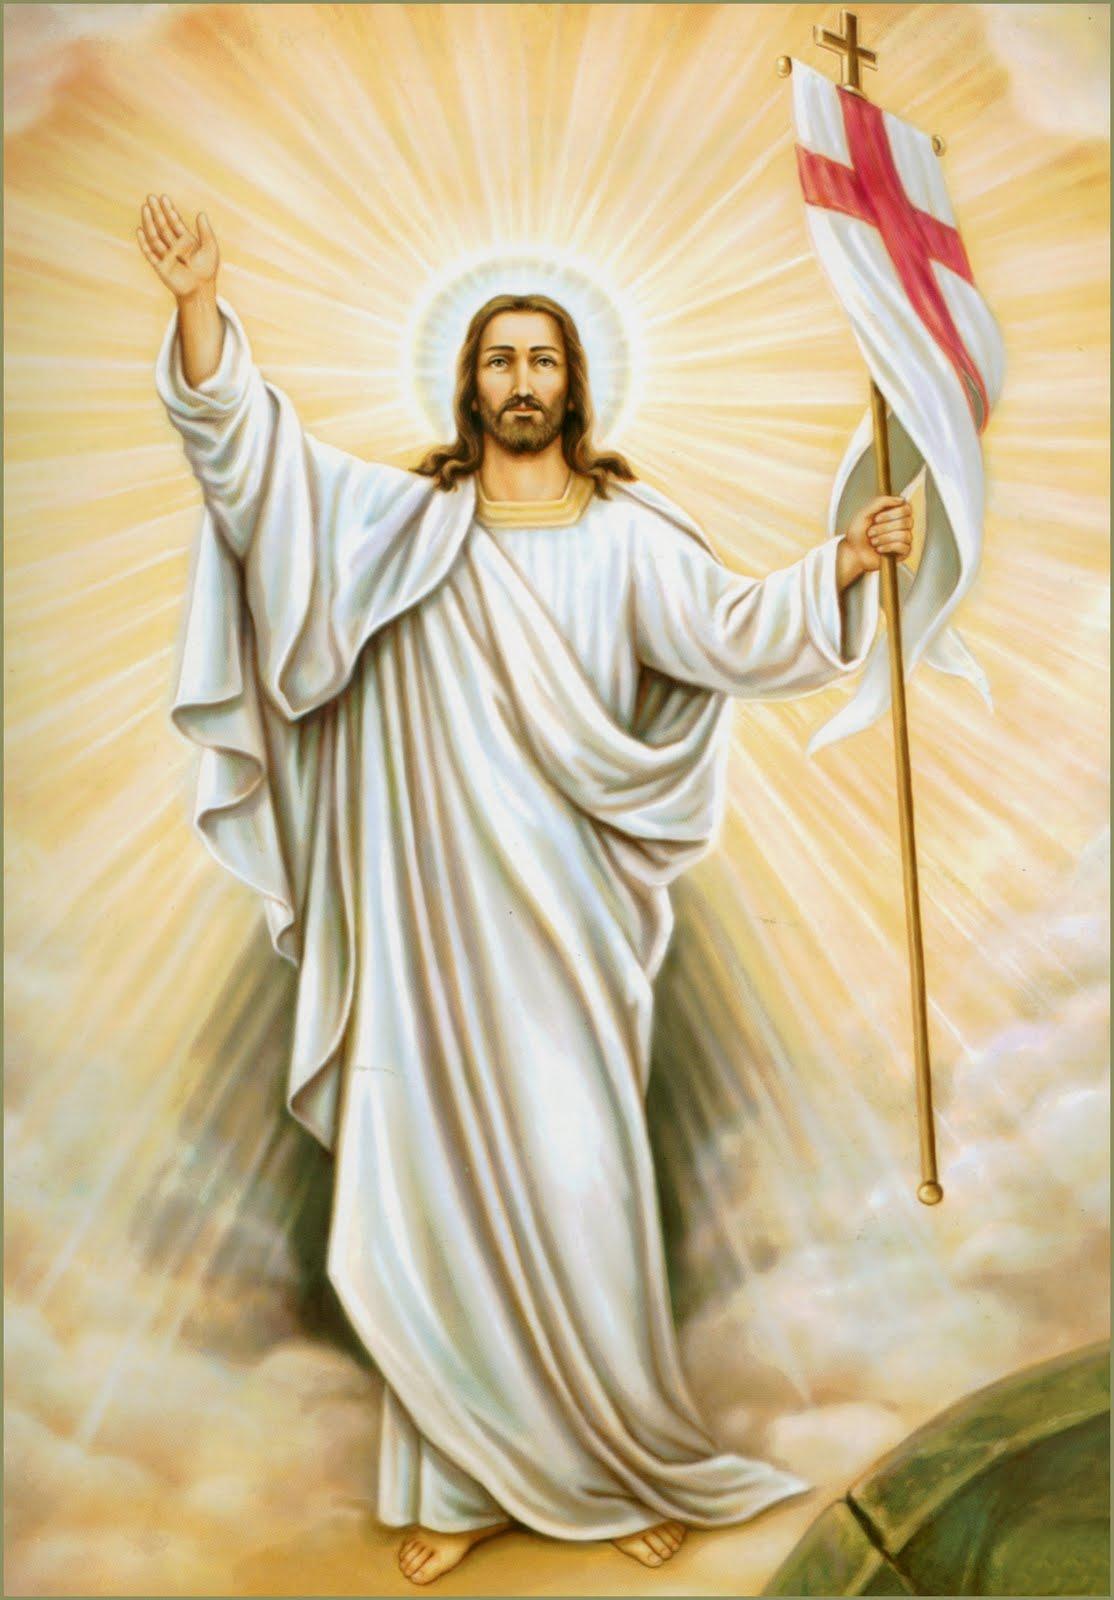 jezus kristus augsamcelsanas